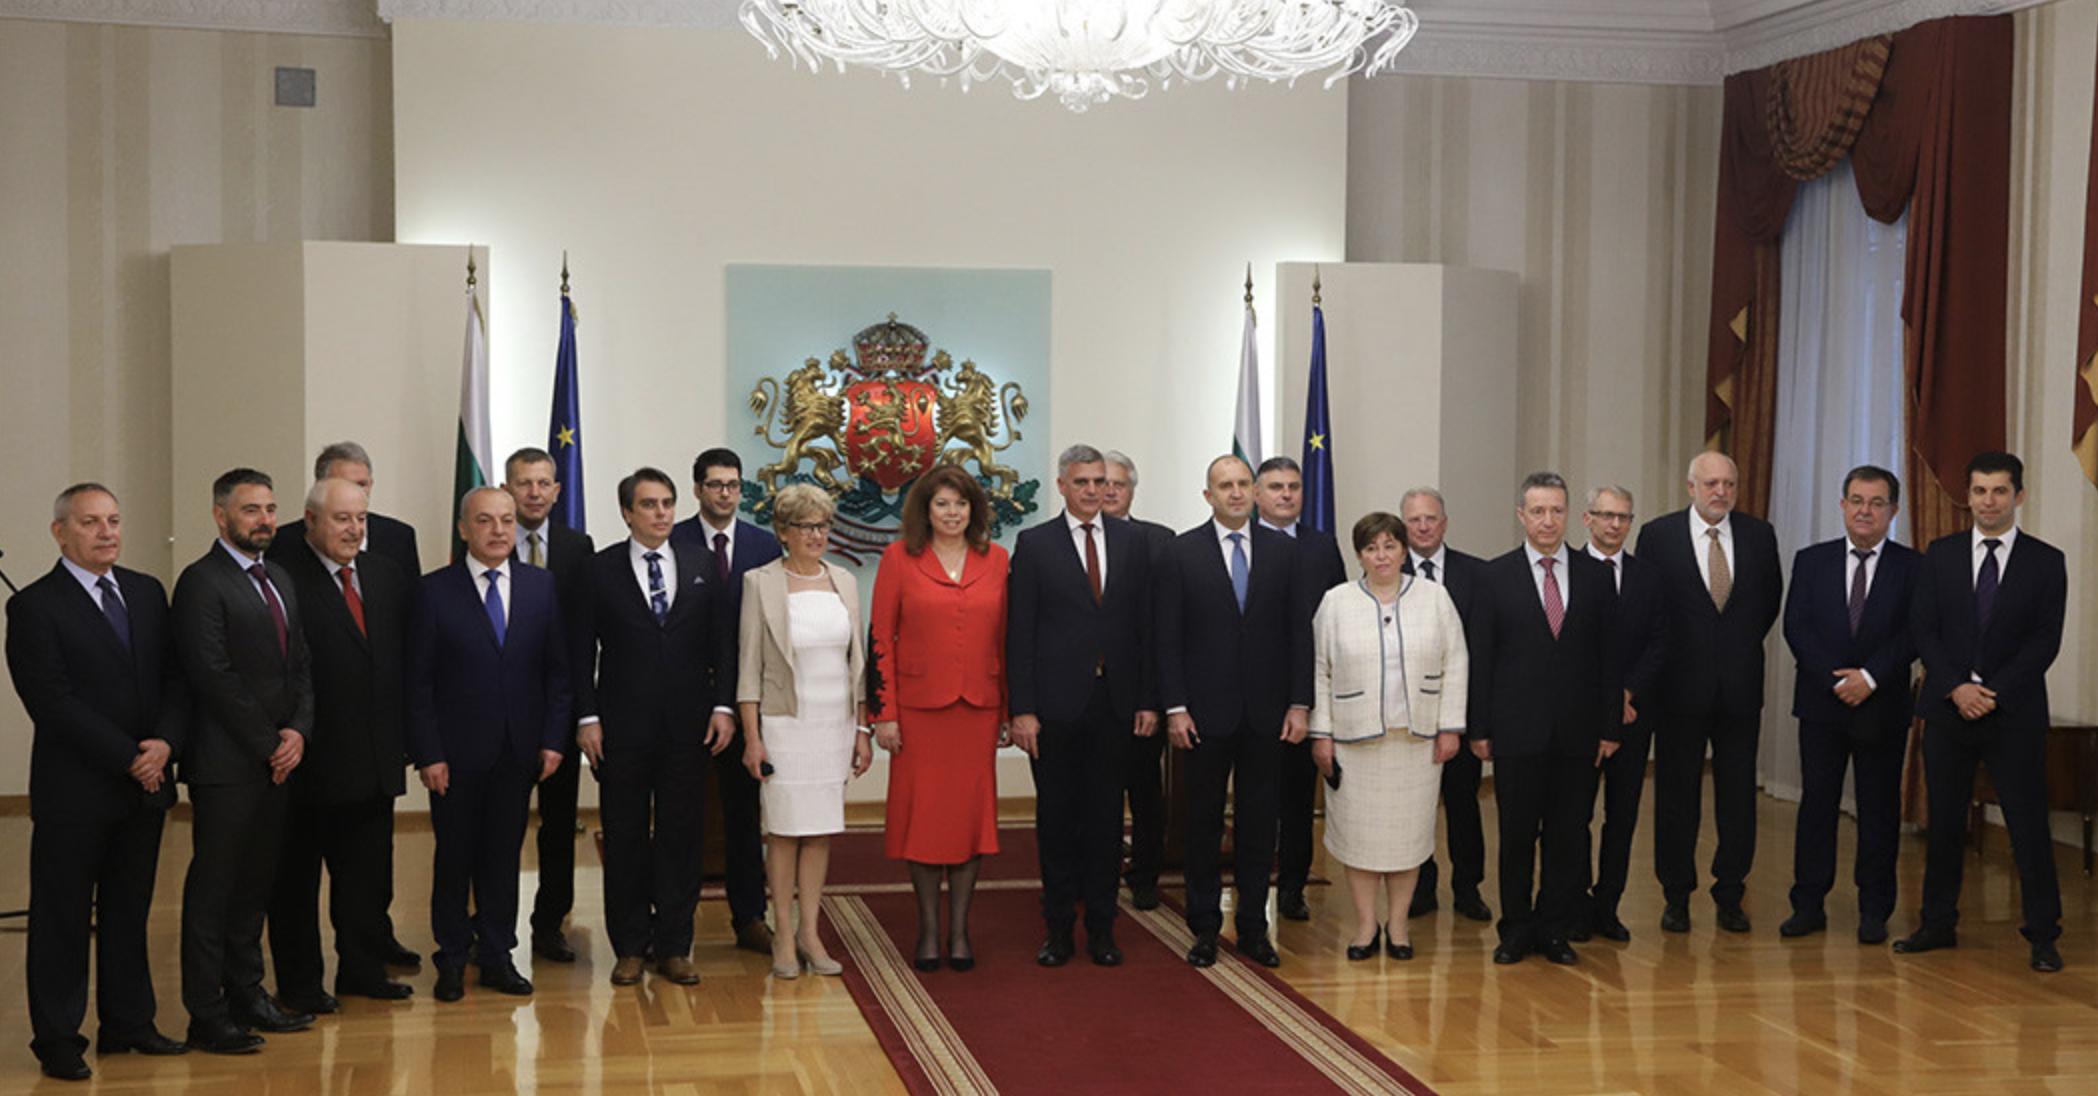 Bulgaria: Caretaker government sworn in before President Radev